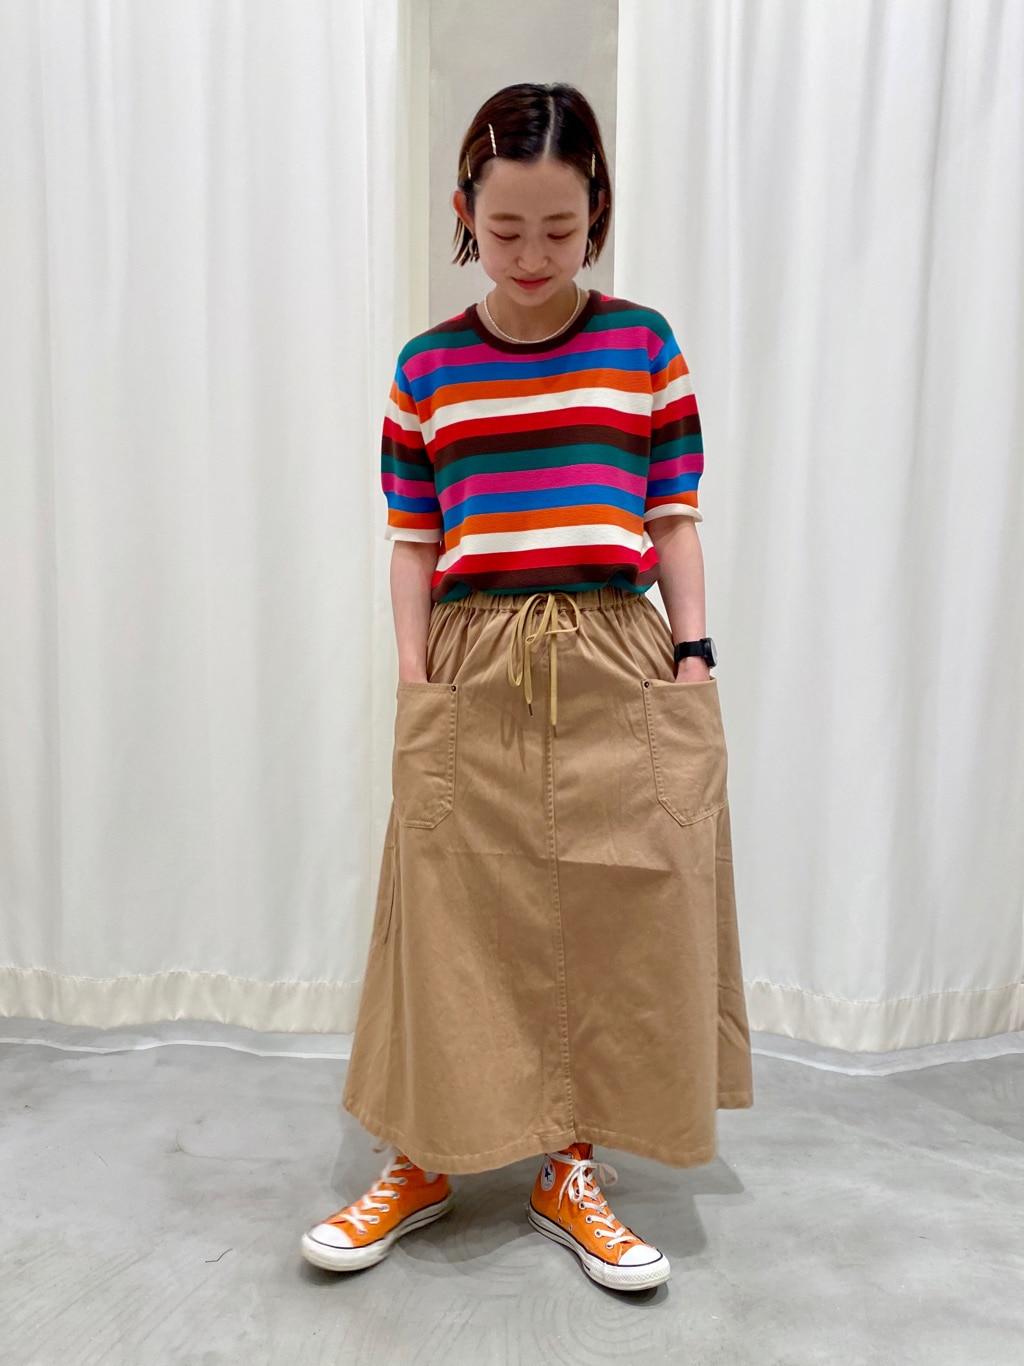 AMB SHOP CHILD WOMAN CHILD WOMAN , PAR ICI 東京スカイツリータウン・ソラマチ 身長:150cm 2020.07.22